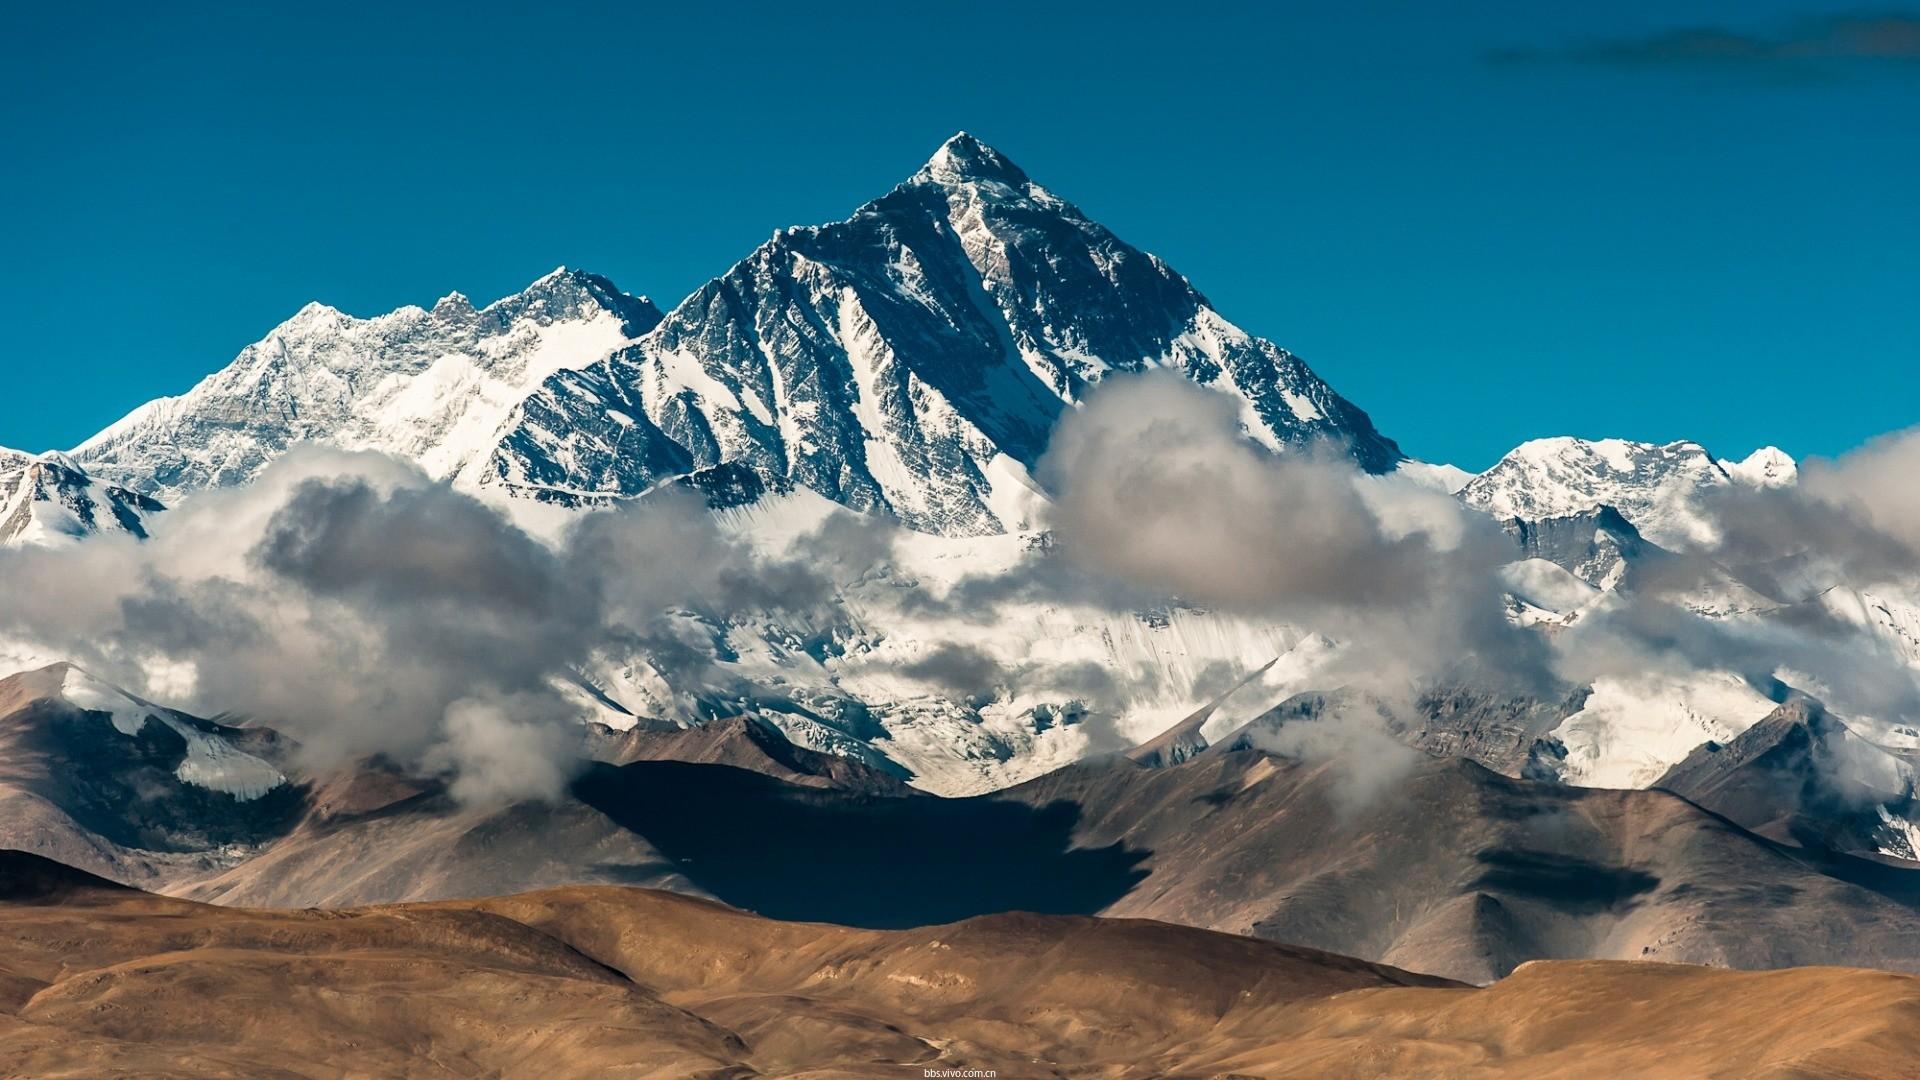 【v粉主题素材壁纸】喜马拉雅山图片高清壁纸